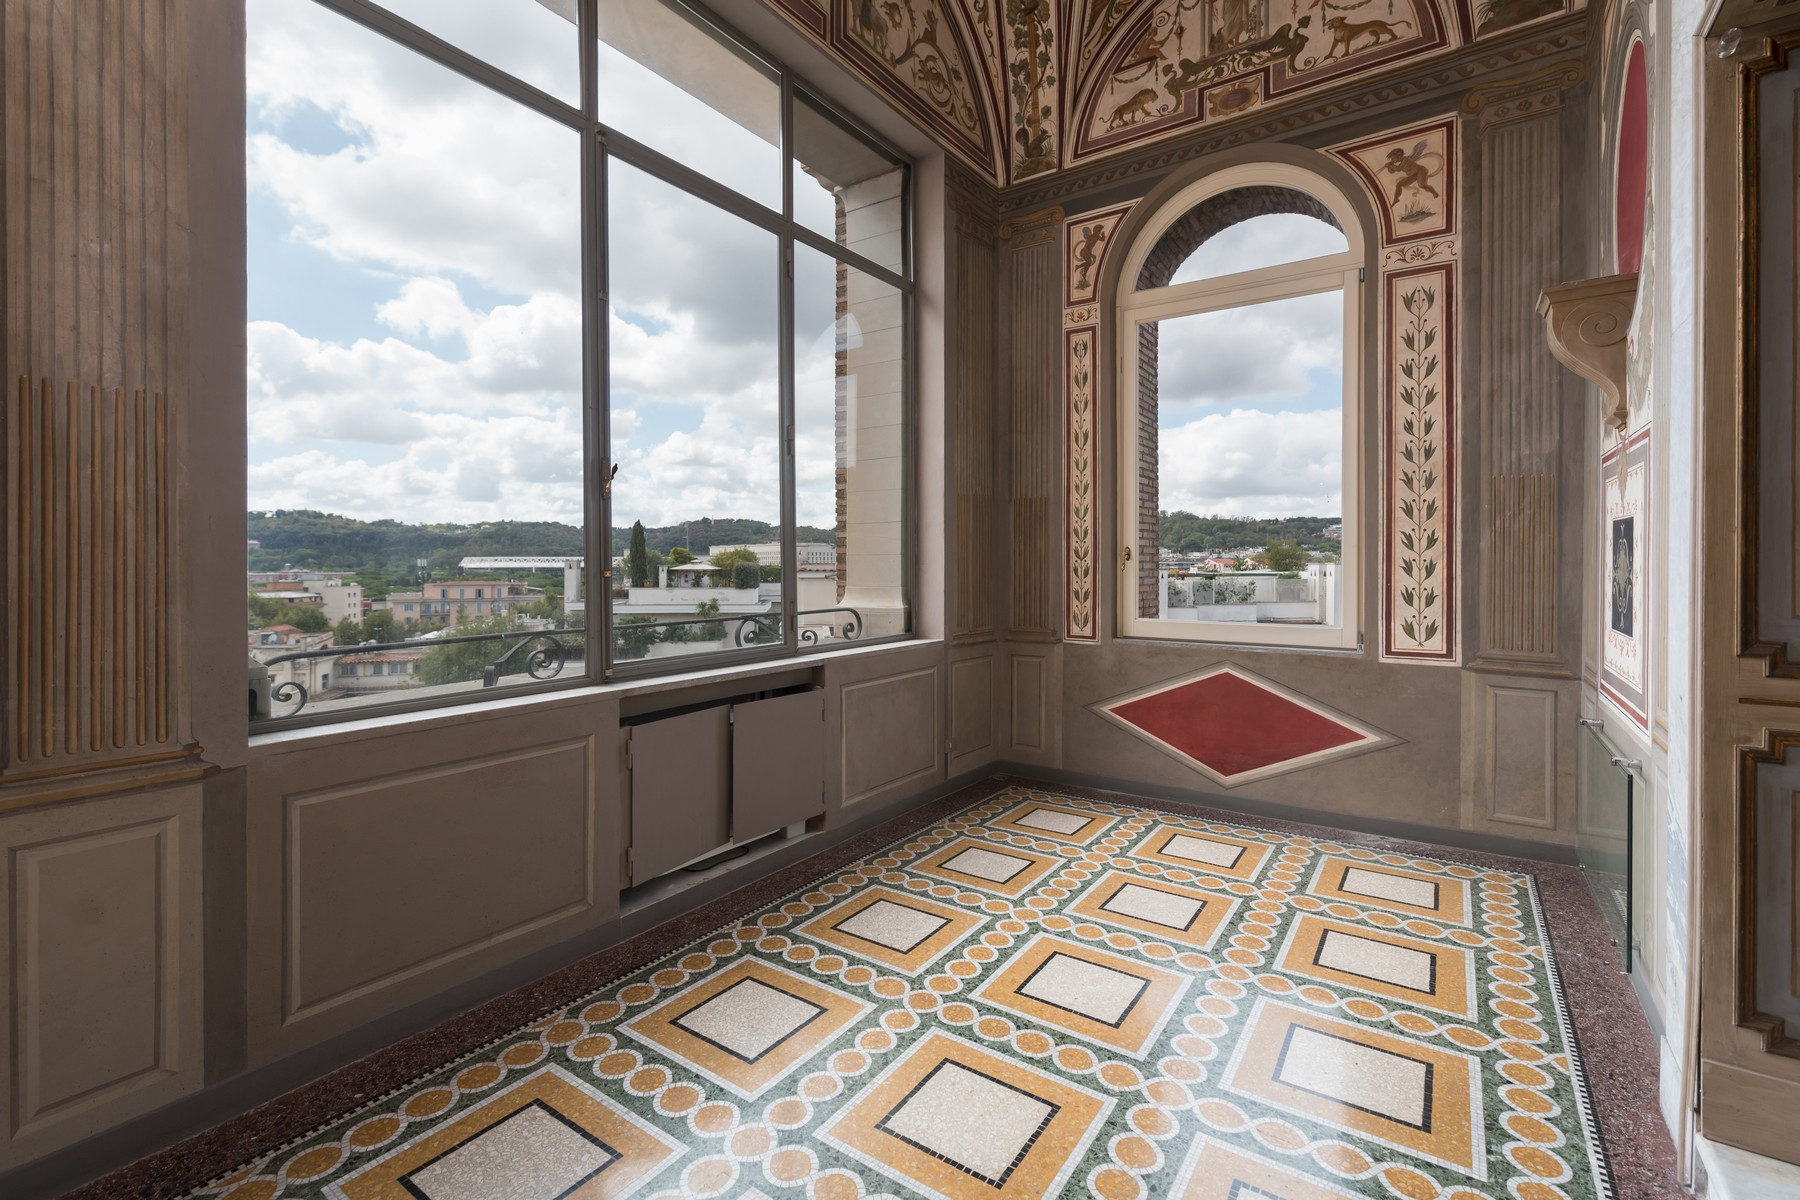 Appartement pour l Vente à Prestigious elegant apartment inside Villa Brasini Rome, Italie